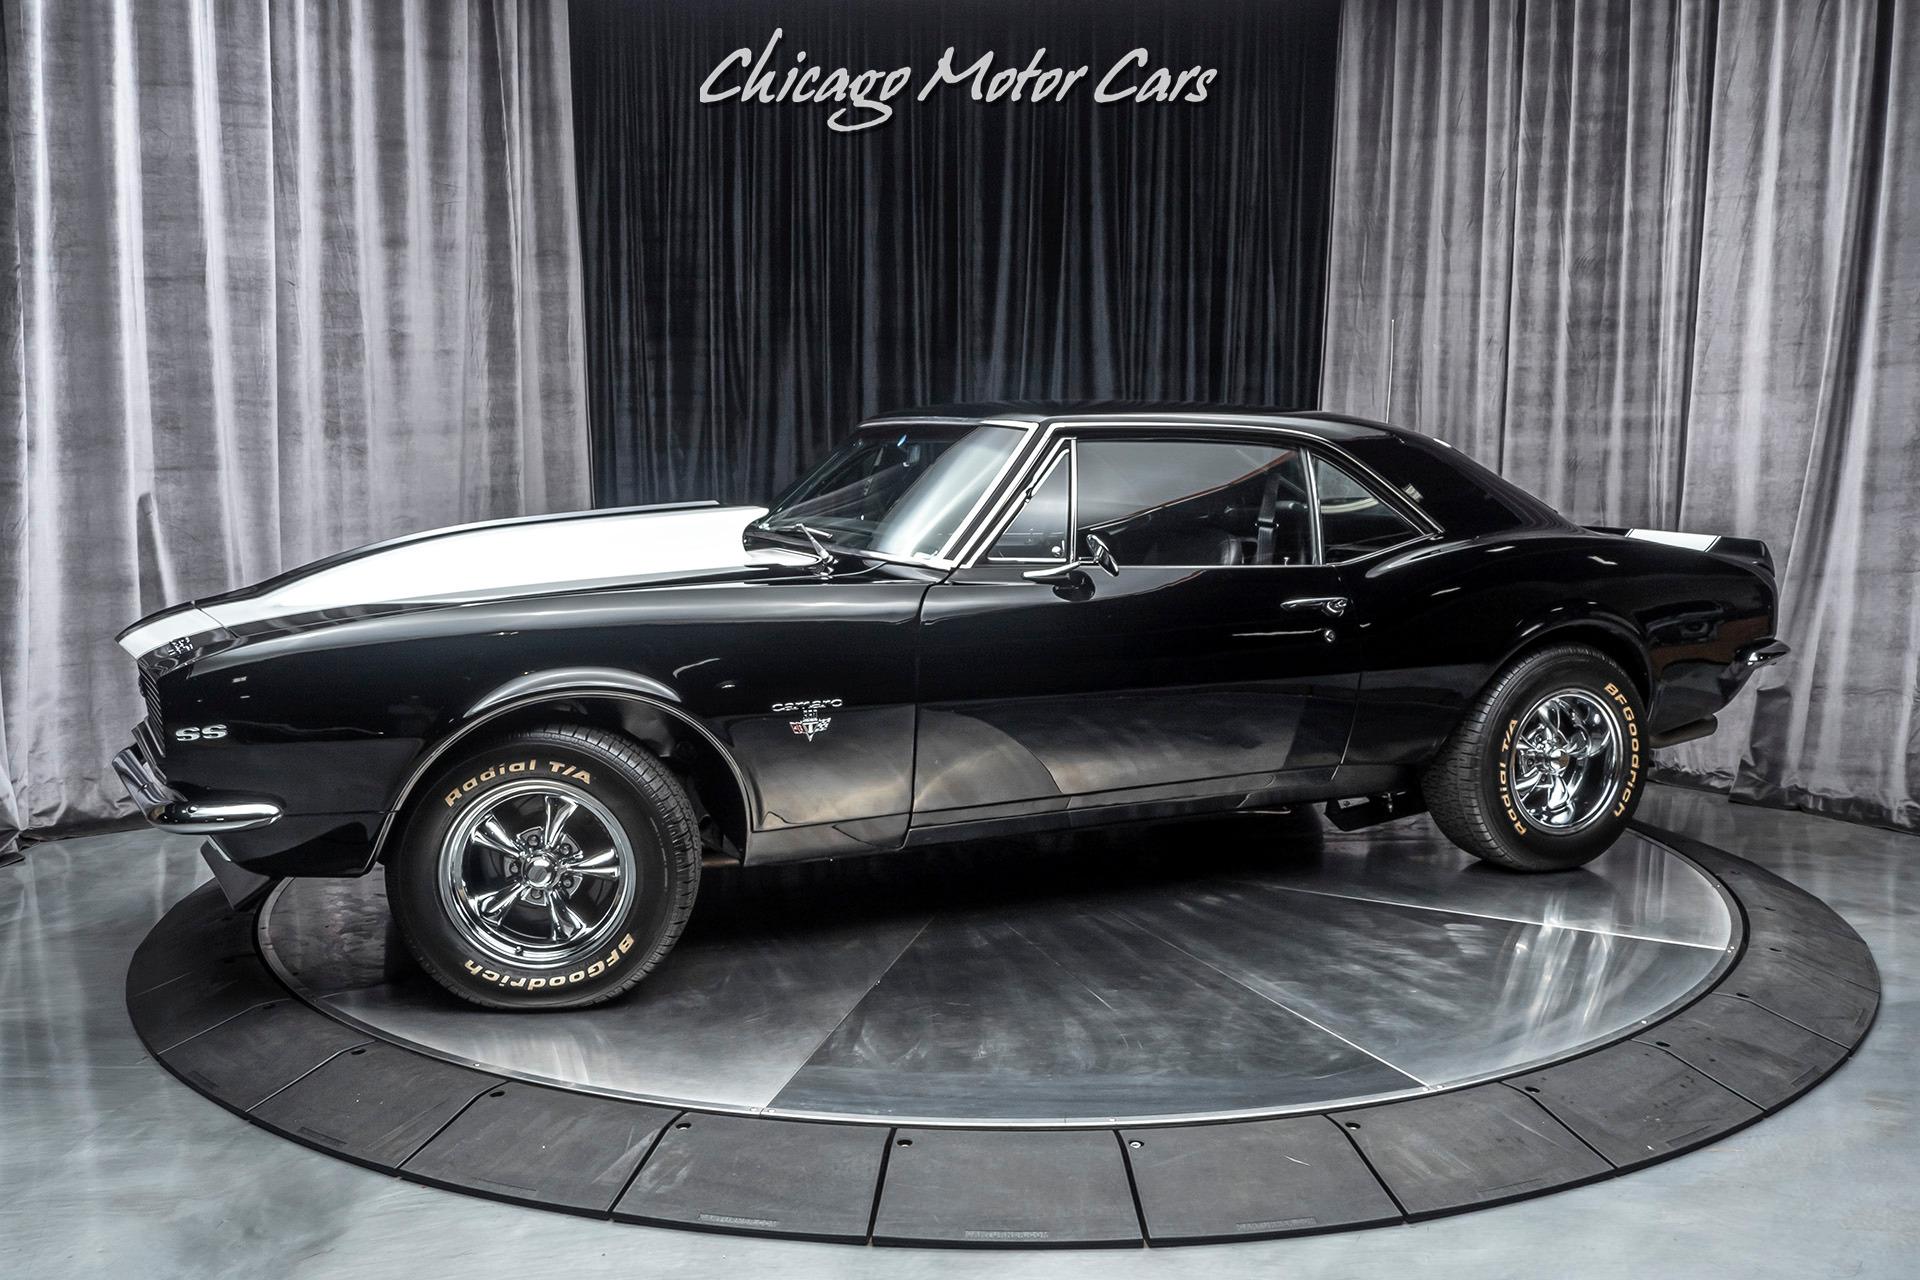 Kekurangan Chevrolet Camaro 1967 Tangguh